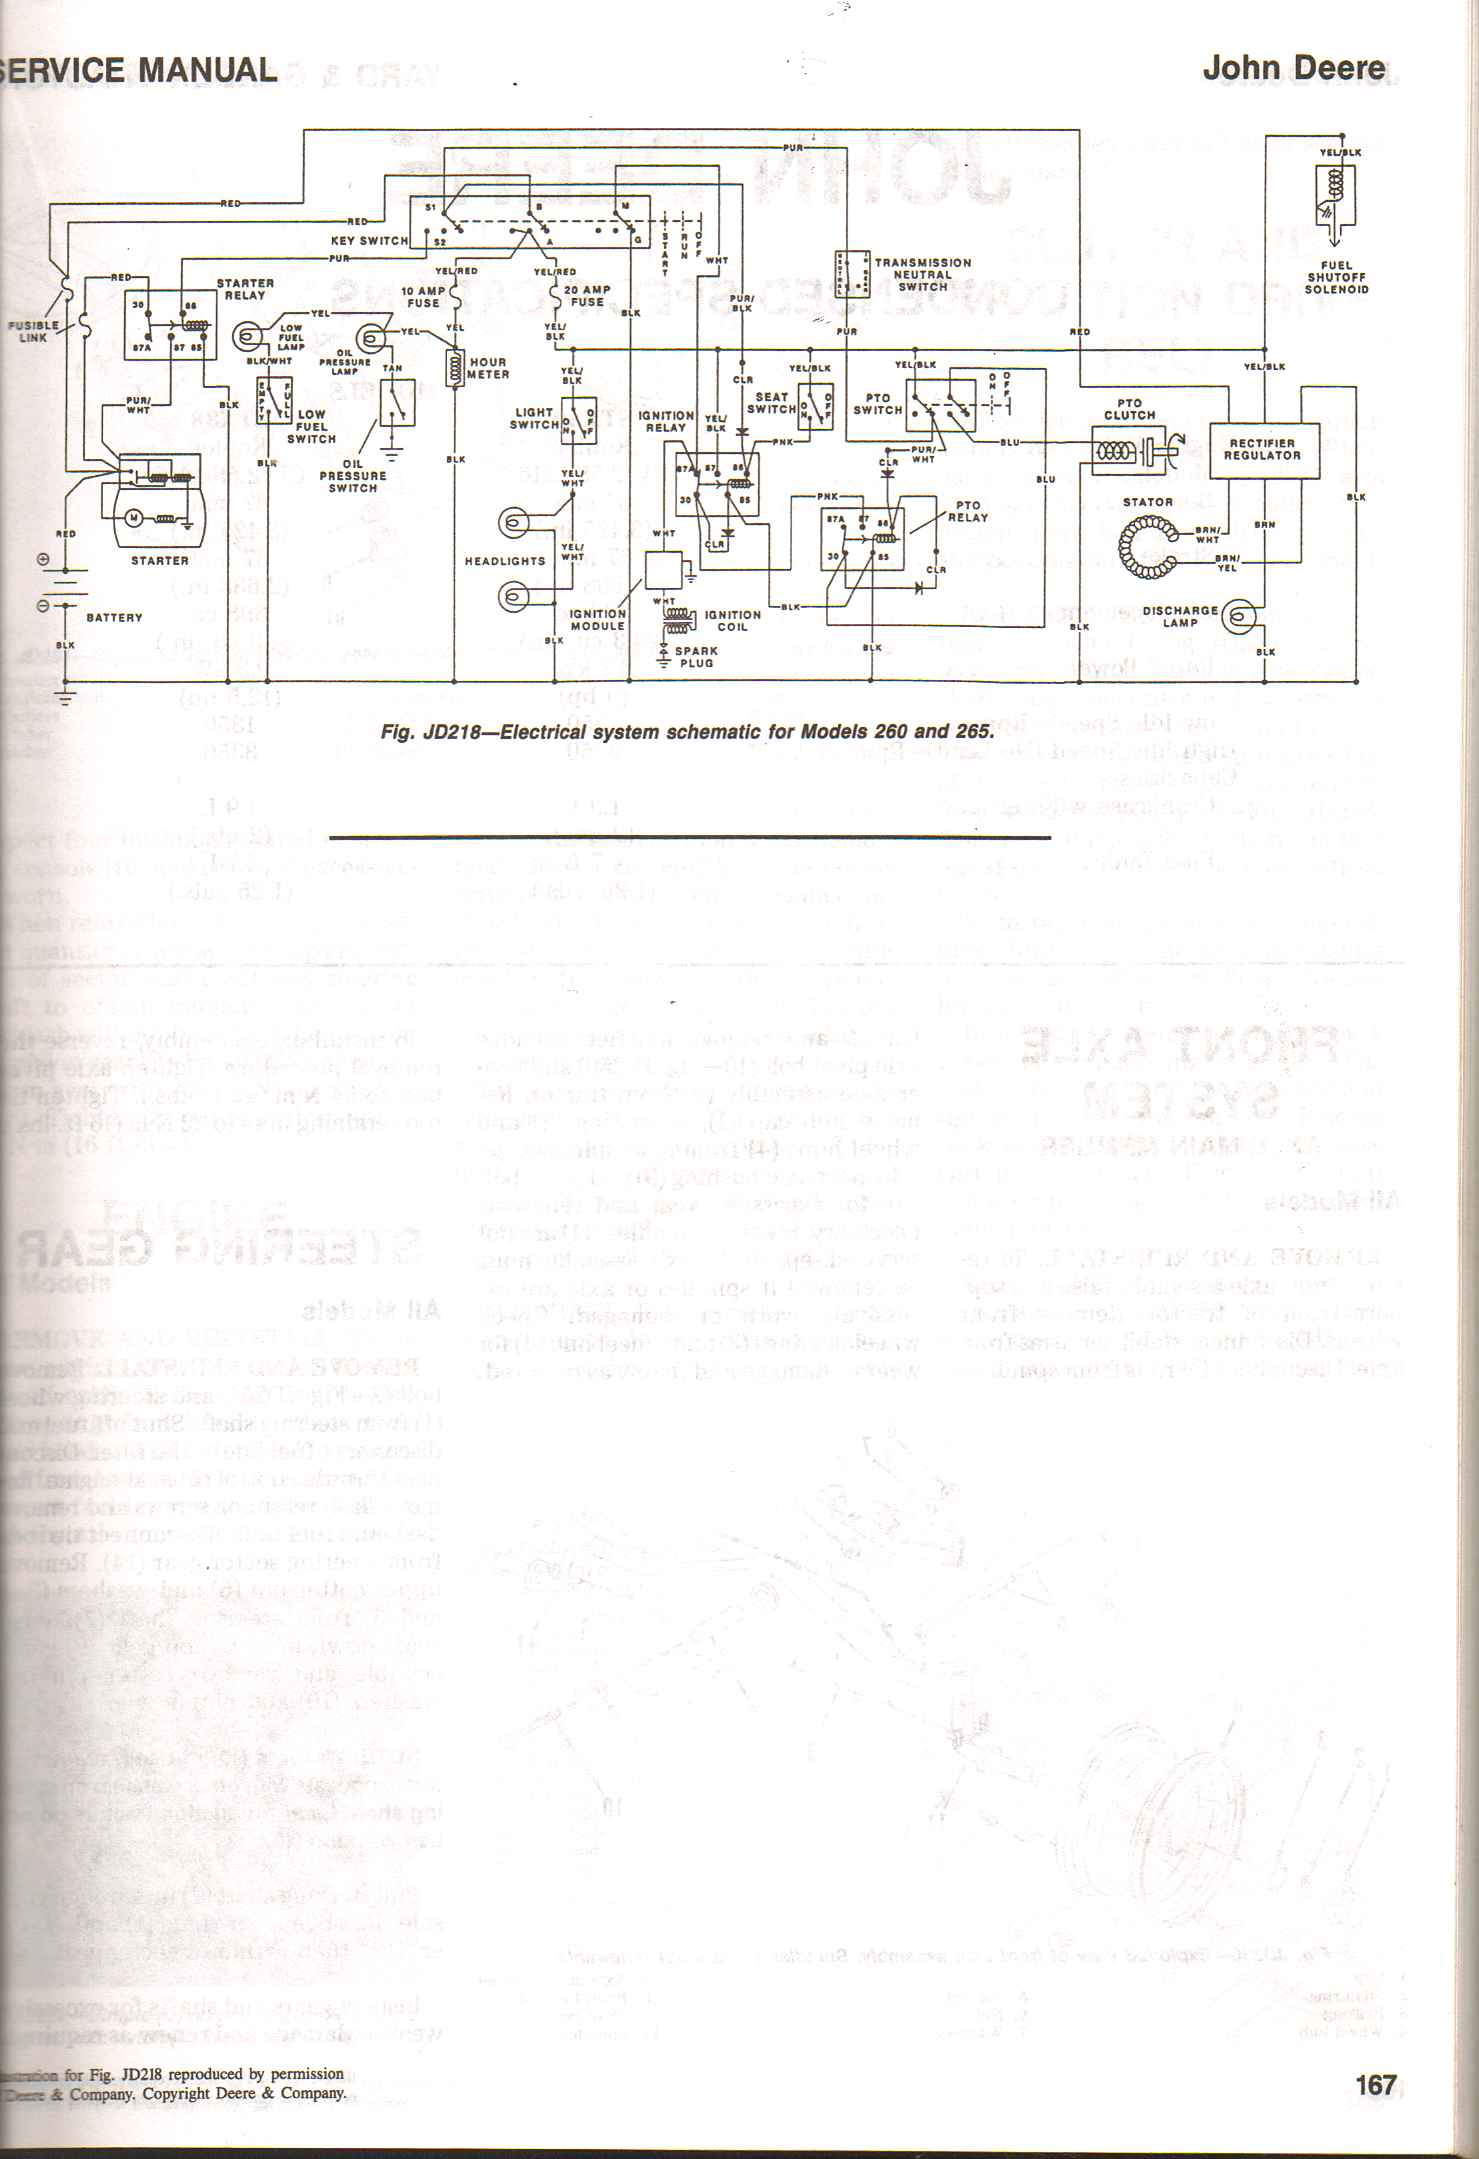 b86141ab-7737-4c46-8677-90f47d4e0afd_Deere 265 wiring1.jpg